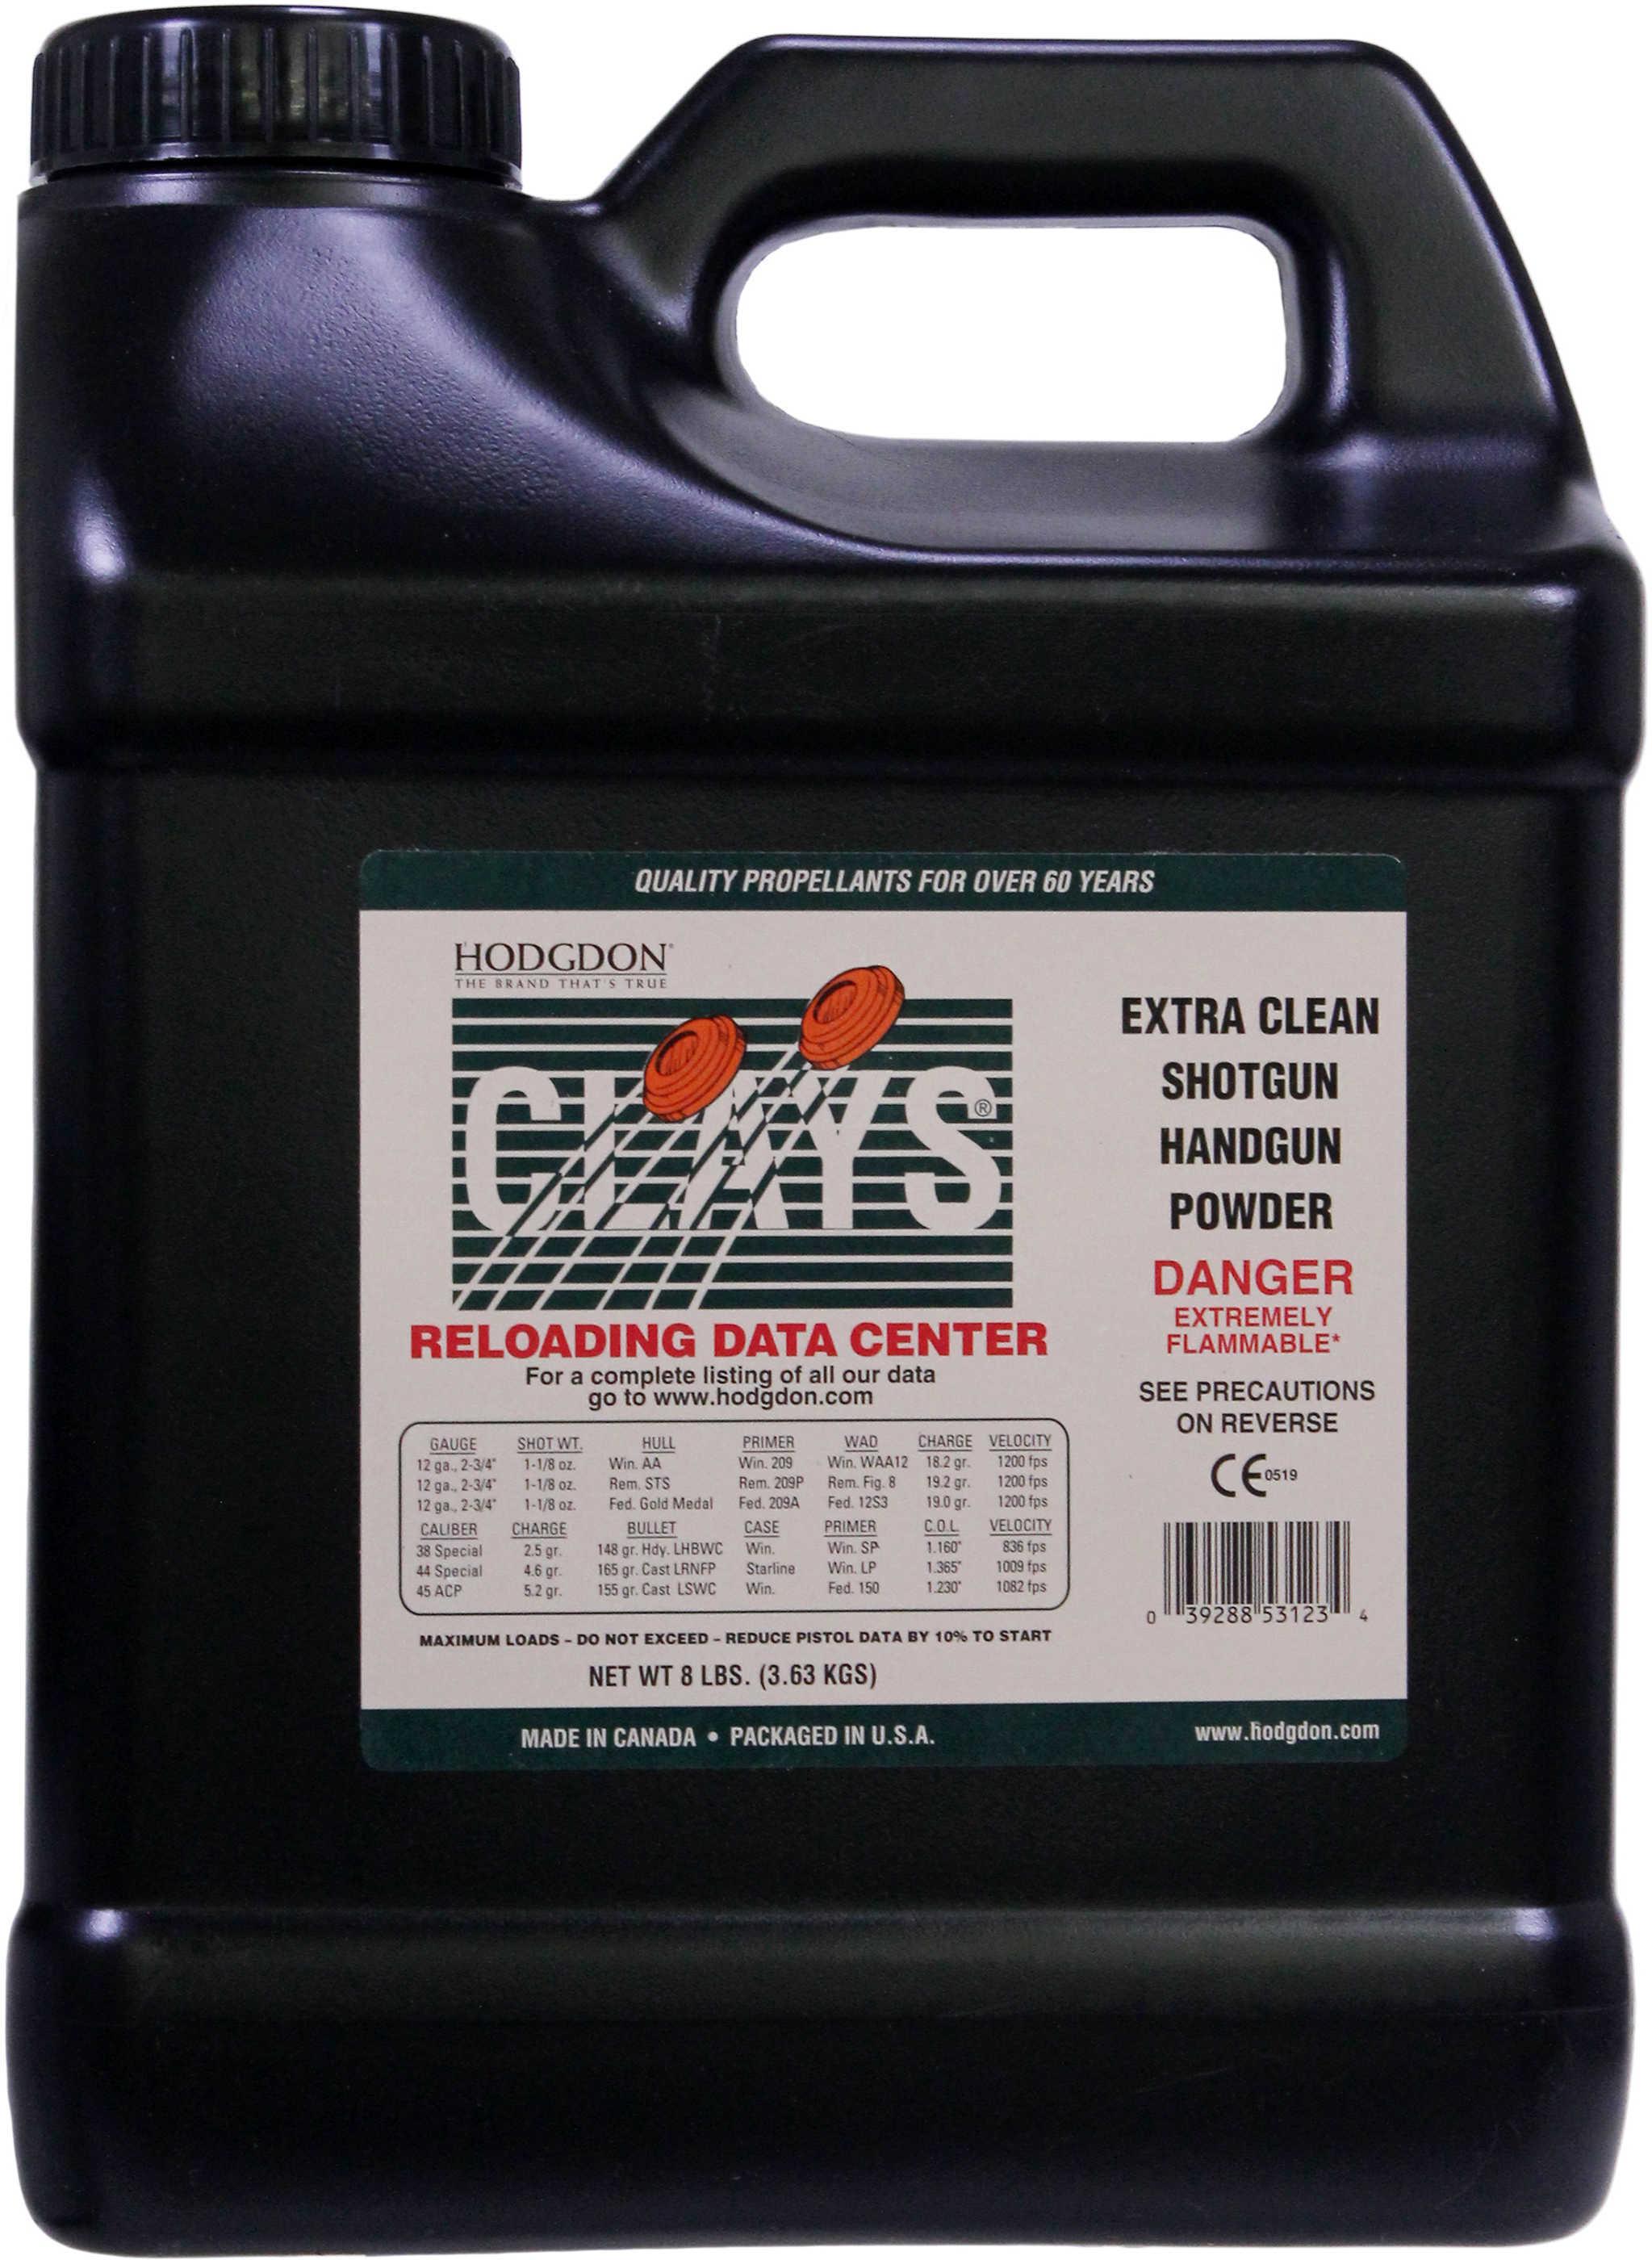 Hodgdon Powder Clays Smokeless 8 Lb